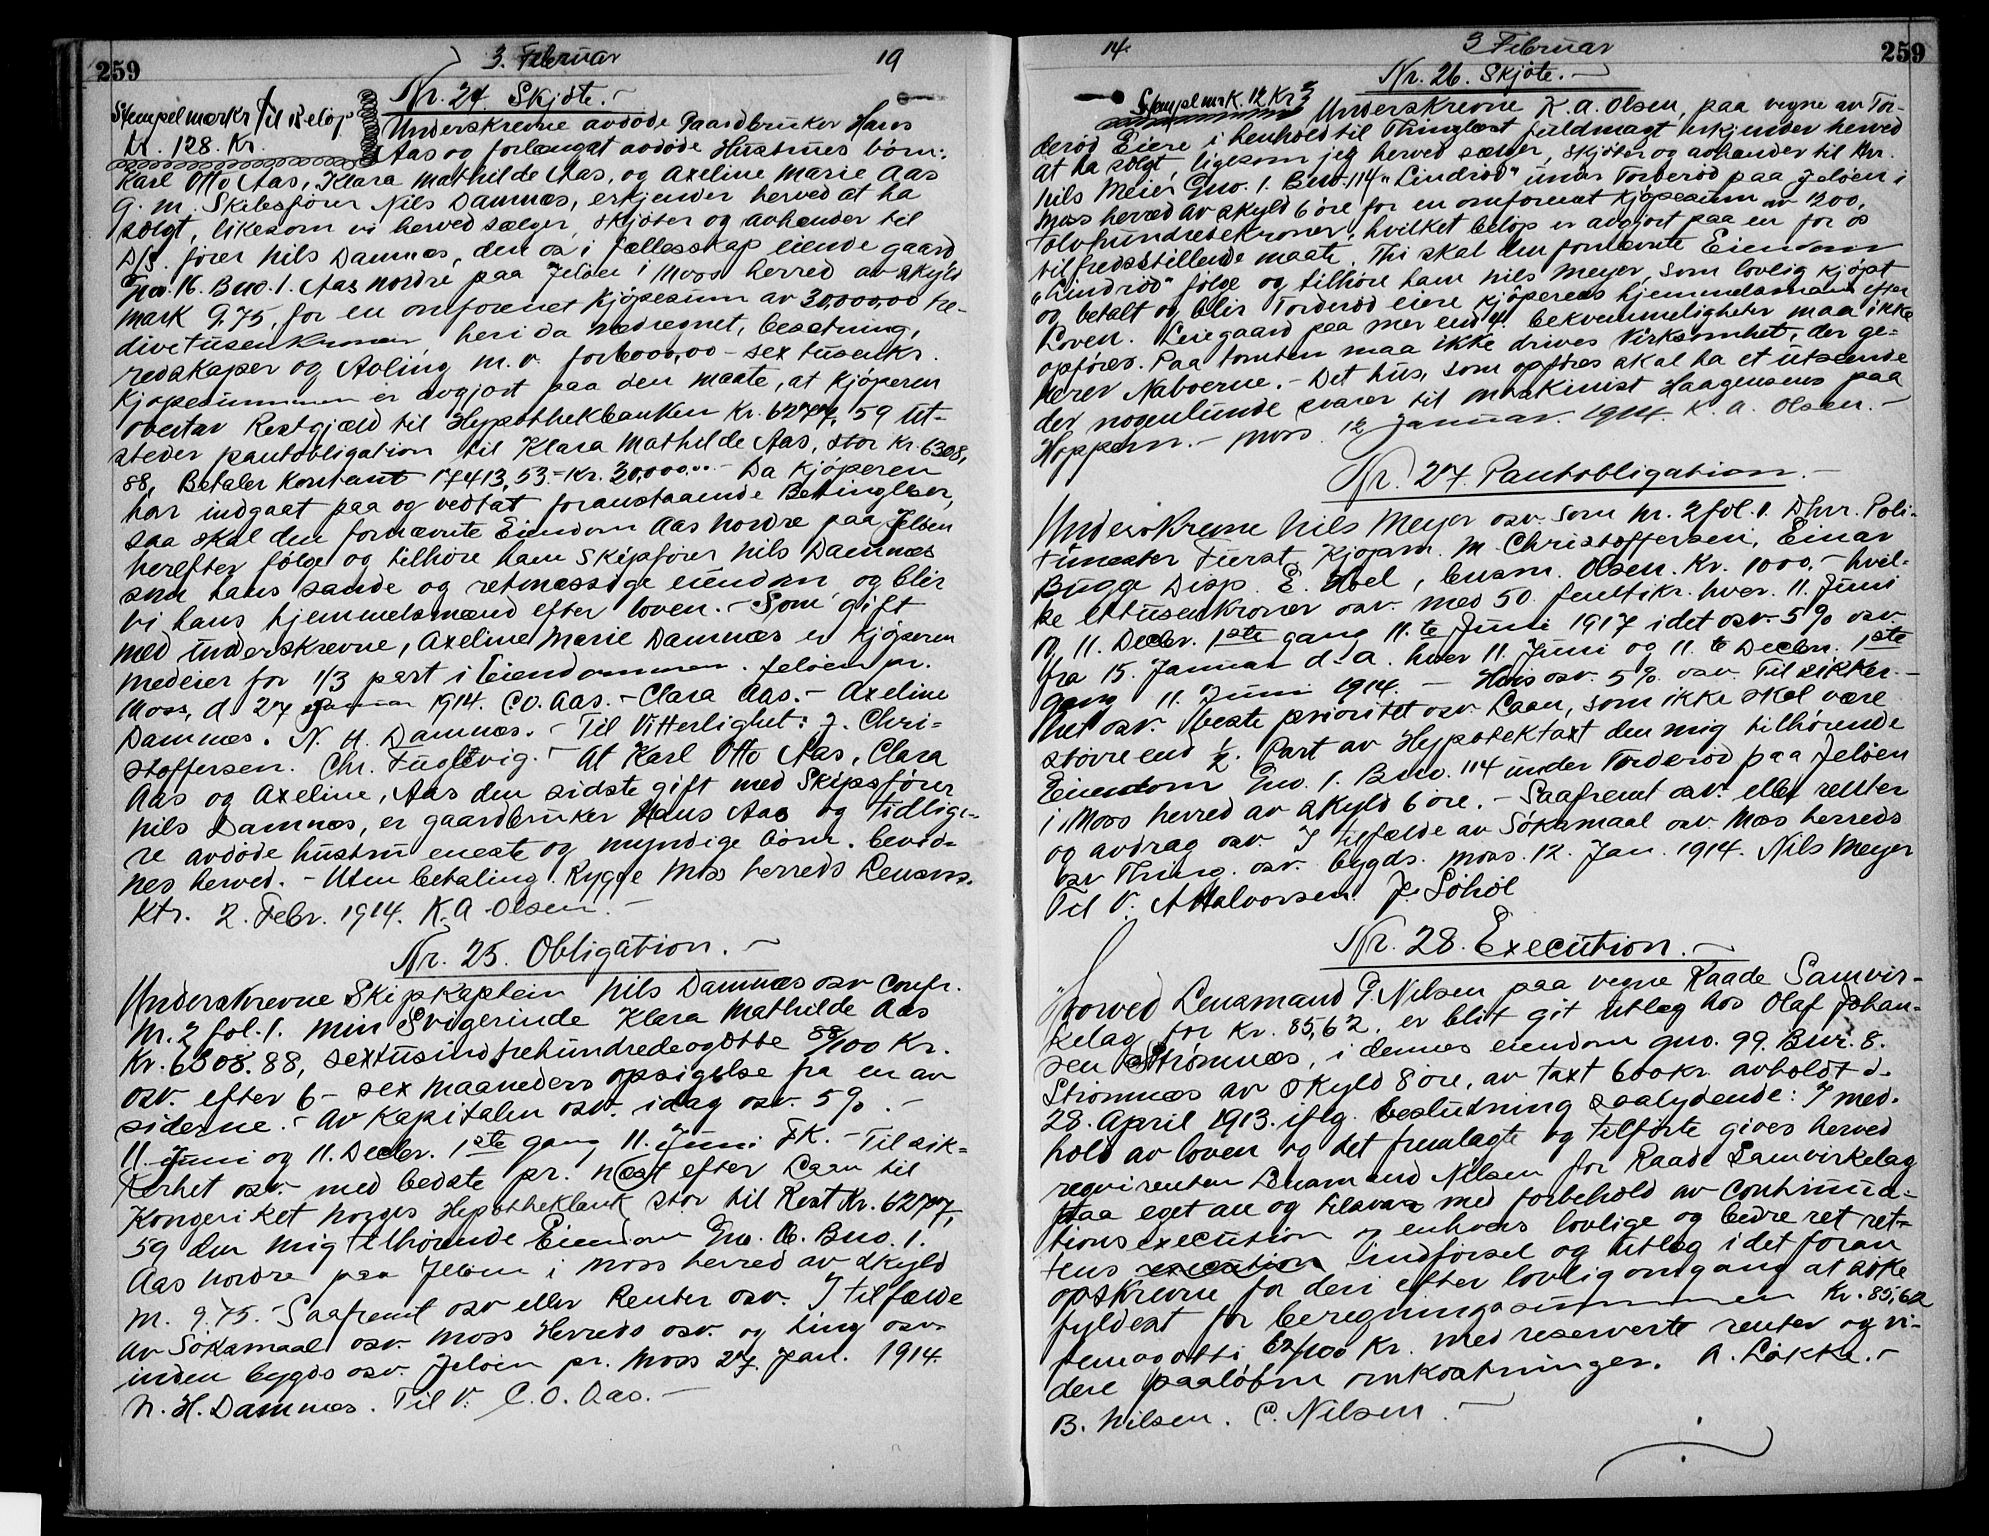 SAO, Moss sorenskriveri, Pantebok nr. 24, 1912-1915, s. 259